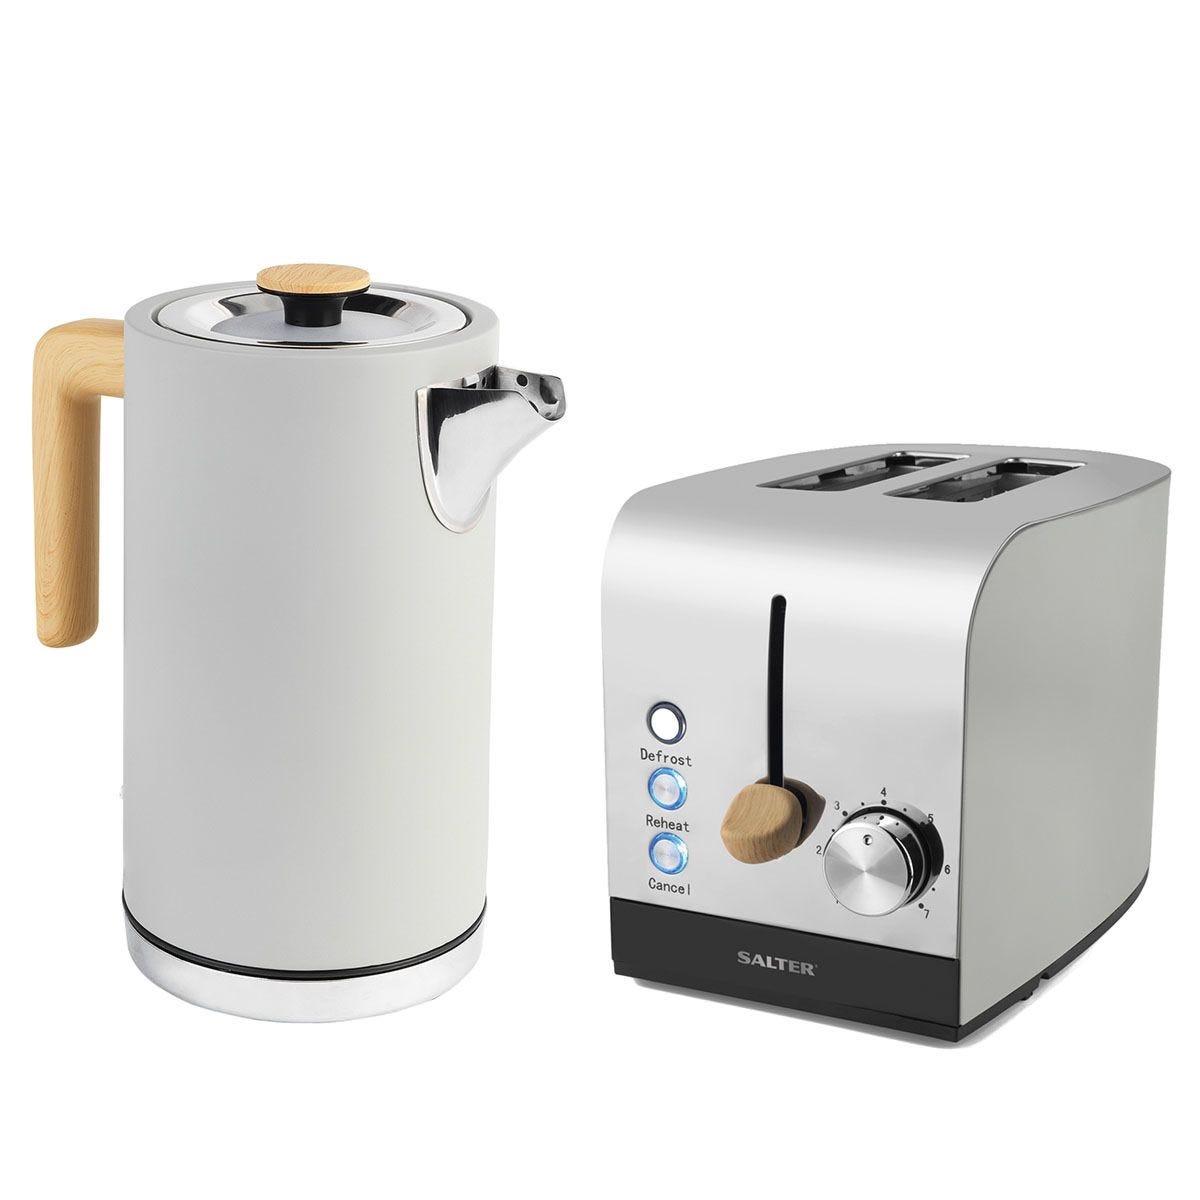 Salter COMBO-4762 Skandi 1.7L Jug Kettle and 2-Slice Toaster Set - Grey